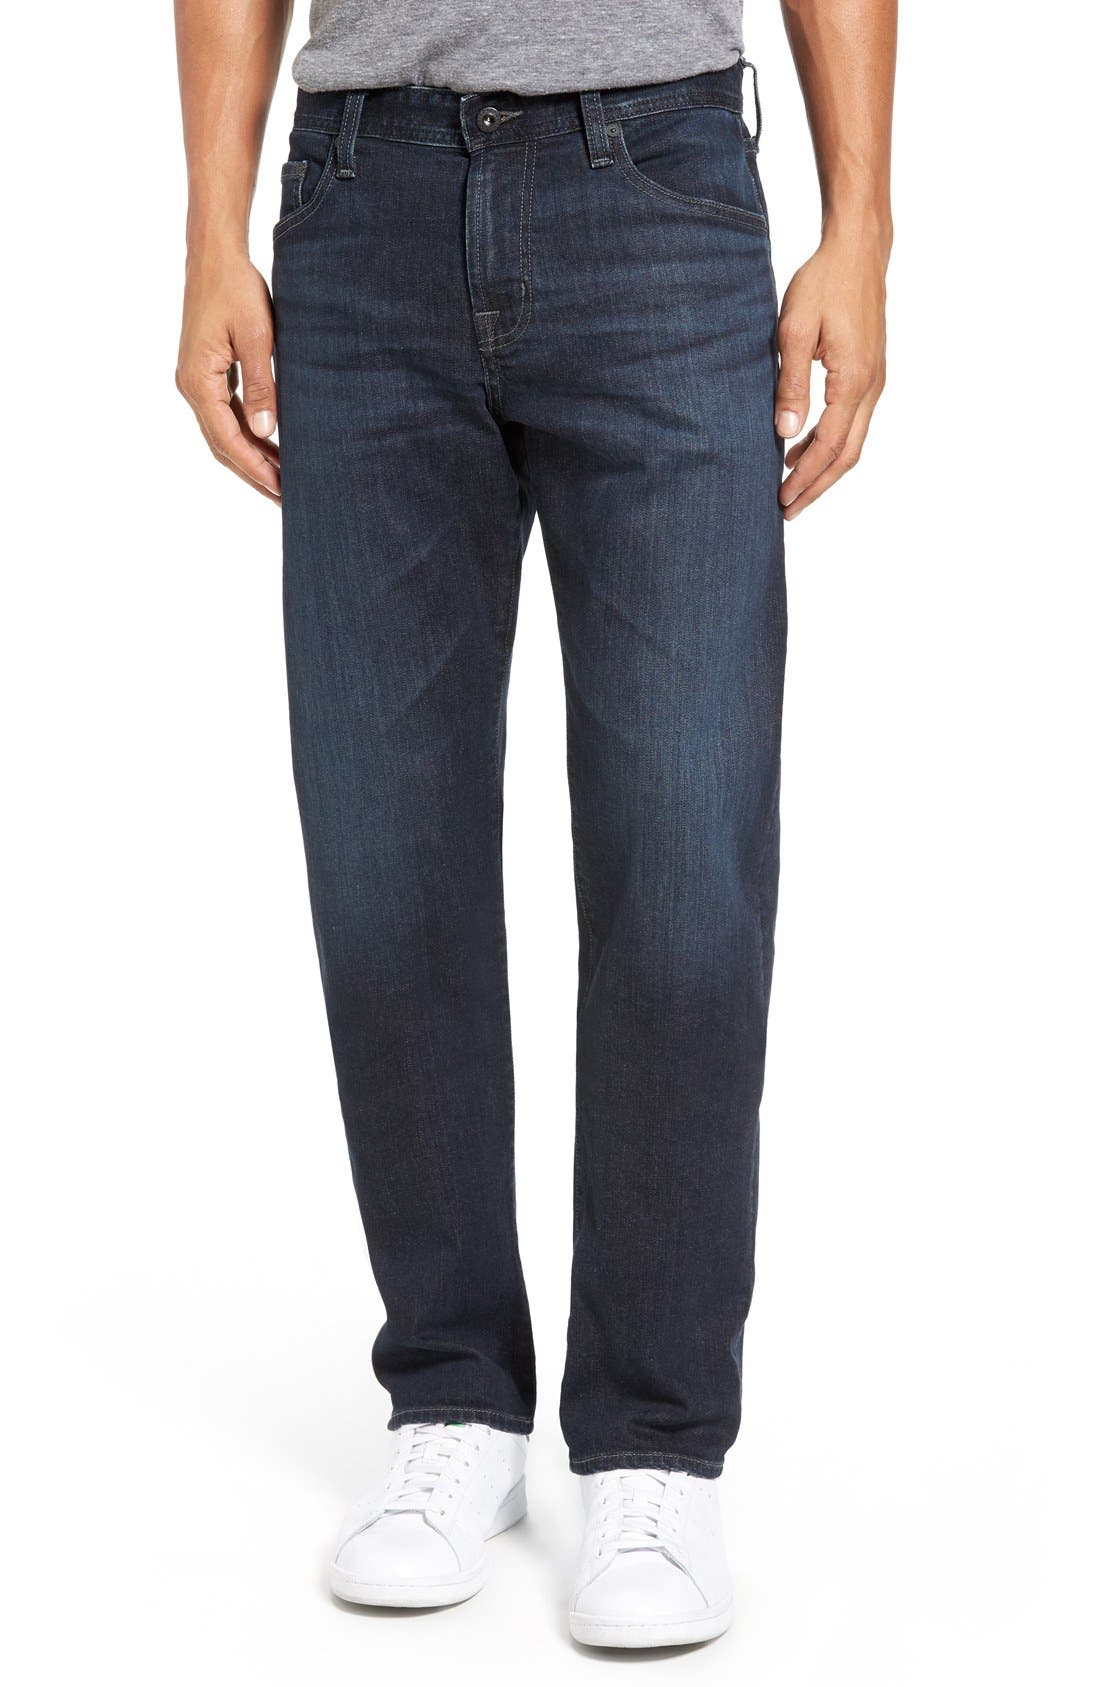 Alternate Image 1 Selected - AG Graduate Slim Straight Leg Jeans (Rockwell)